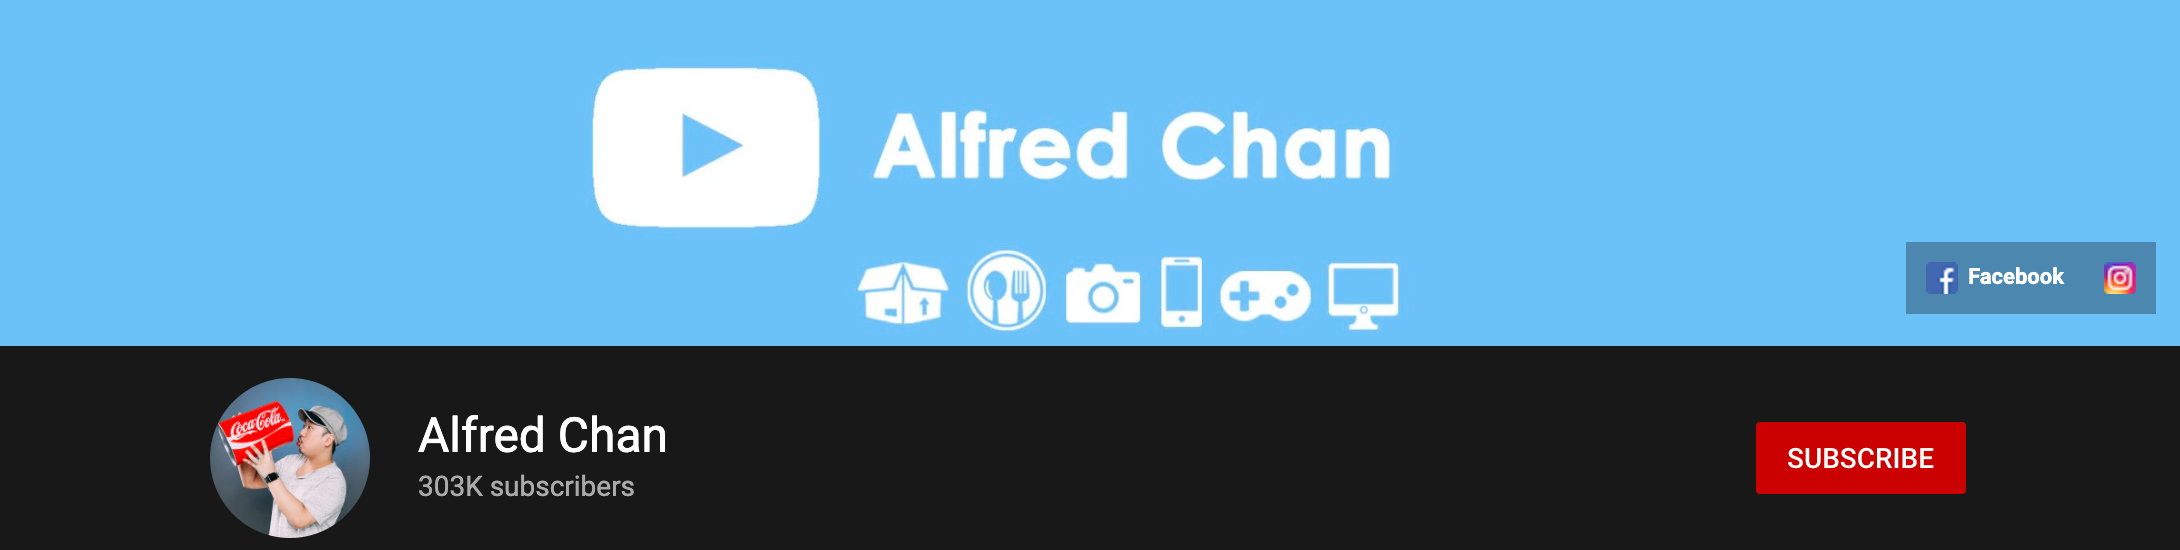 Alfred Chen